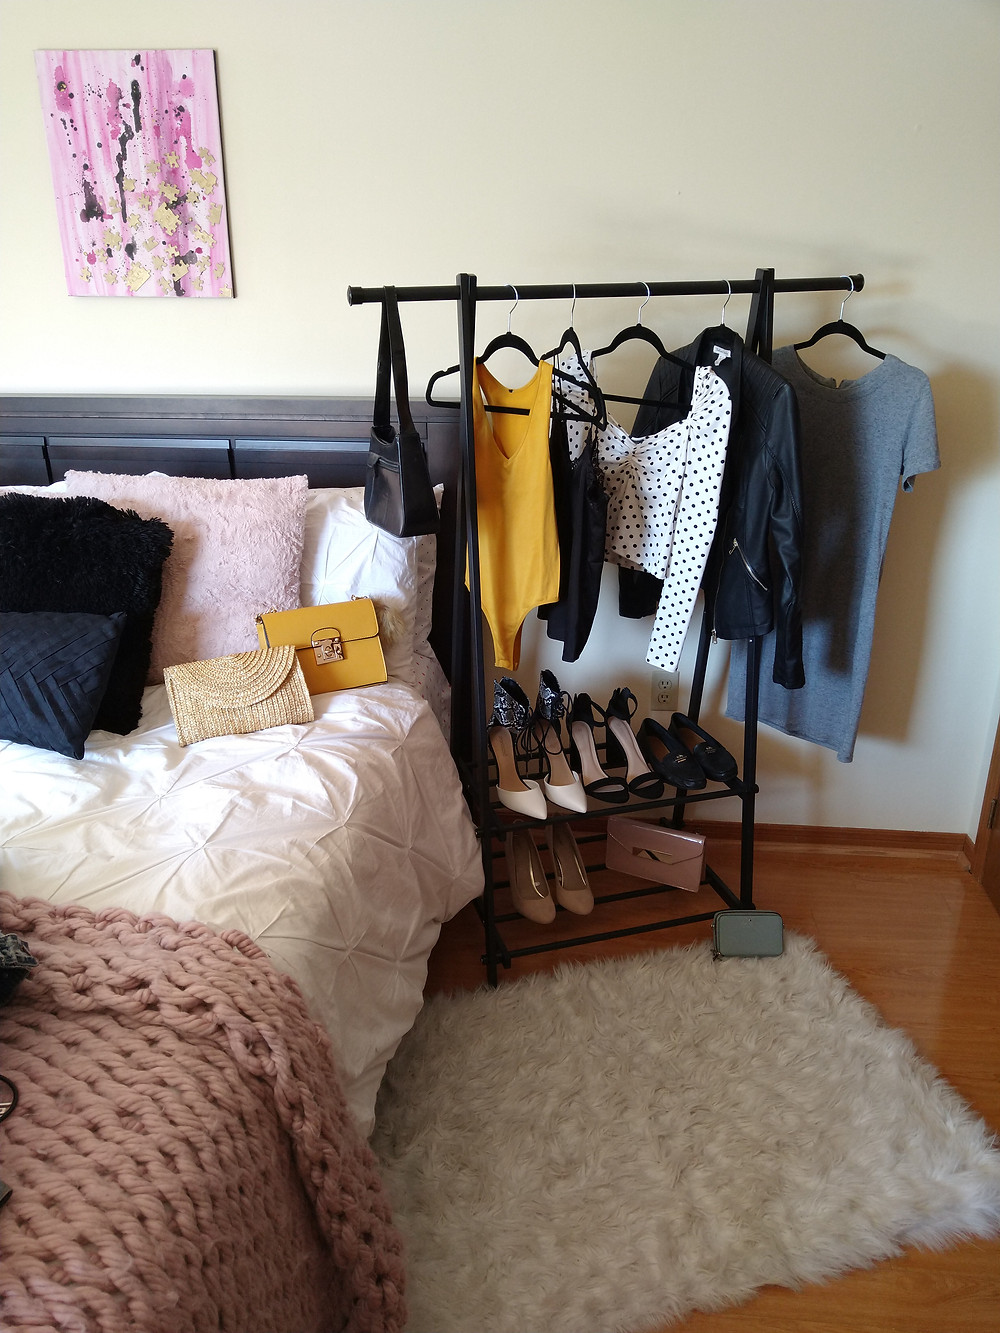 iron clothing rack with clothing on it